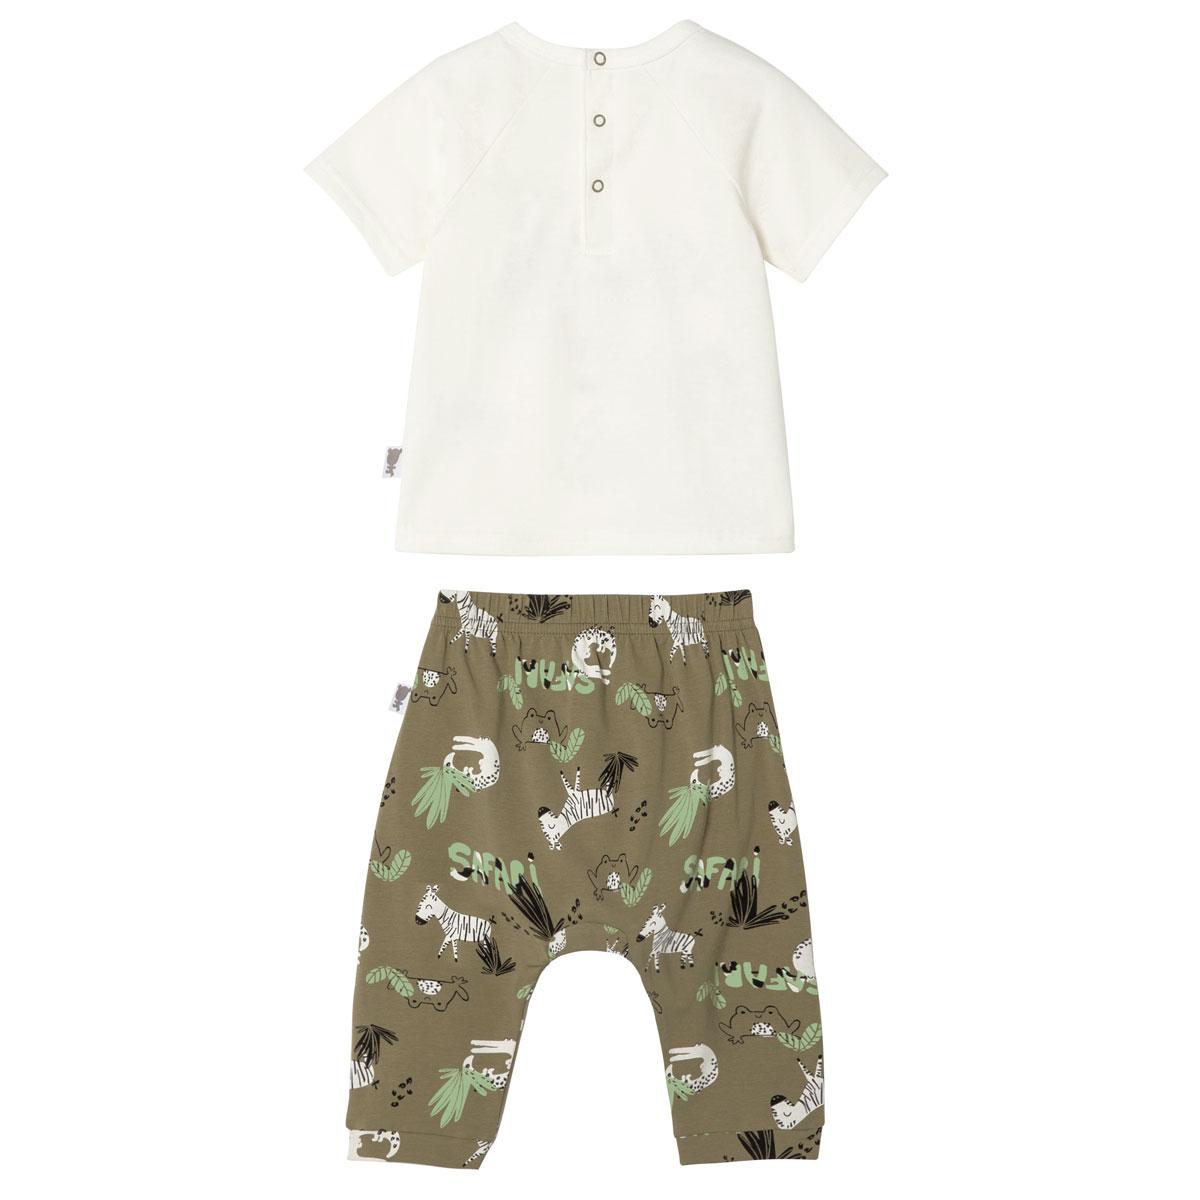 Ensemble bébé garçon t-shirt + sarouel Nerobi dos